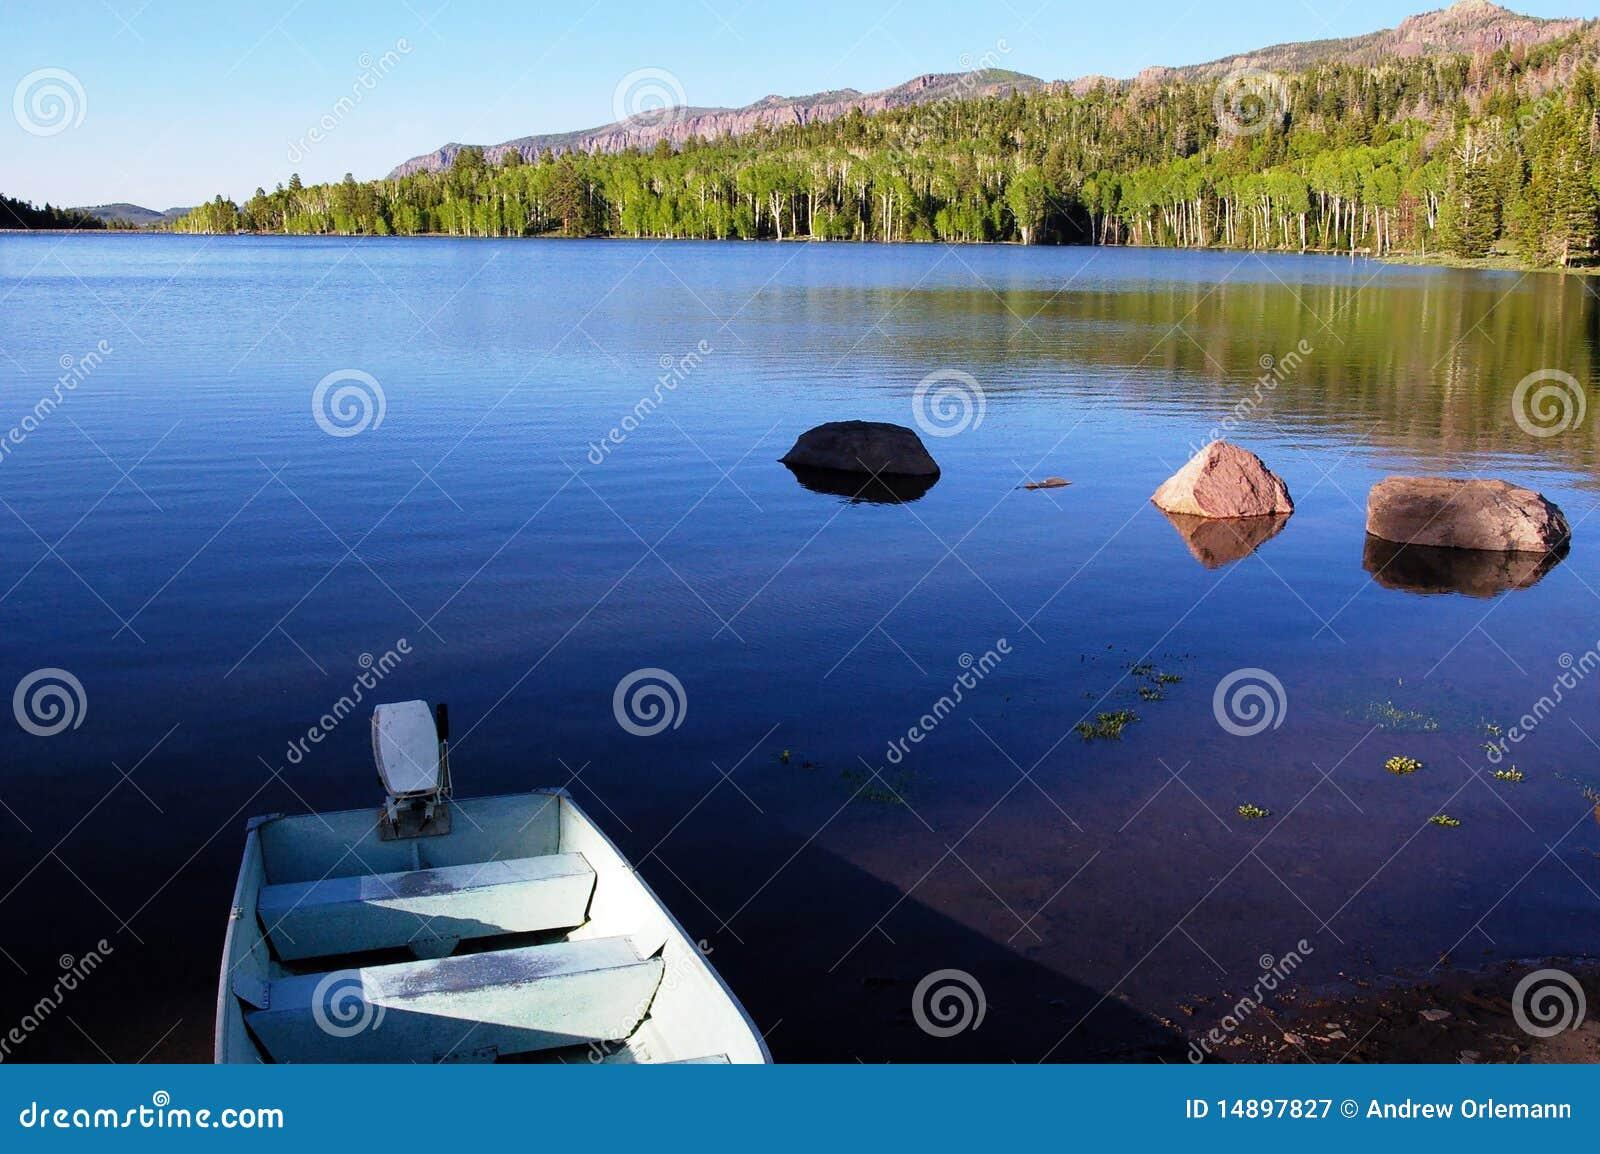 Boat On Lake Royalty Free Stock Photography Image 14897827